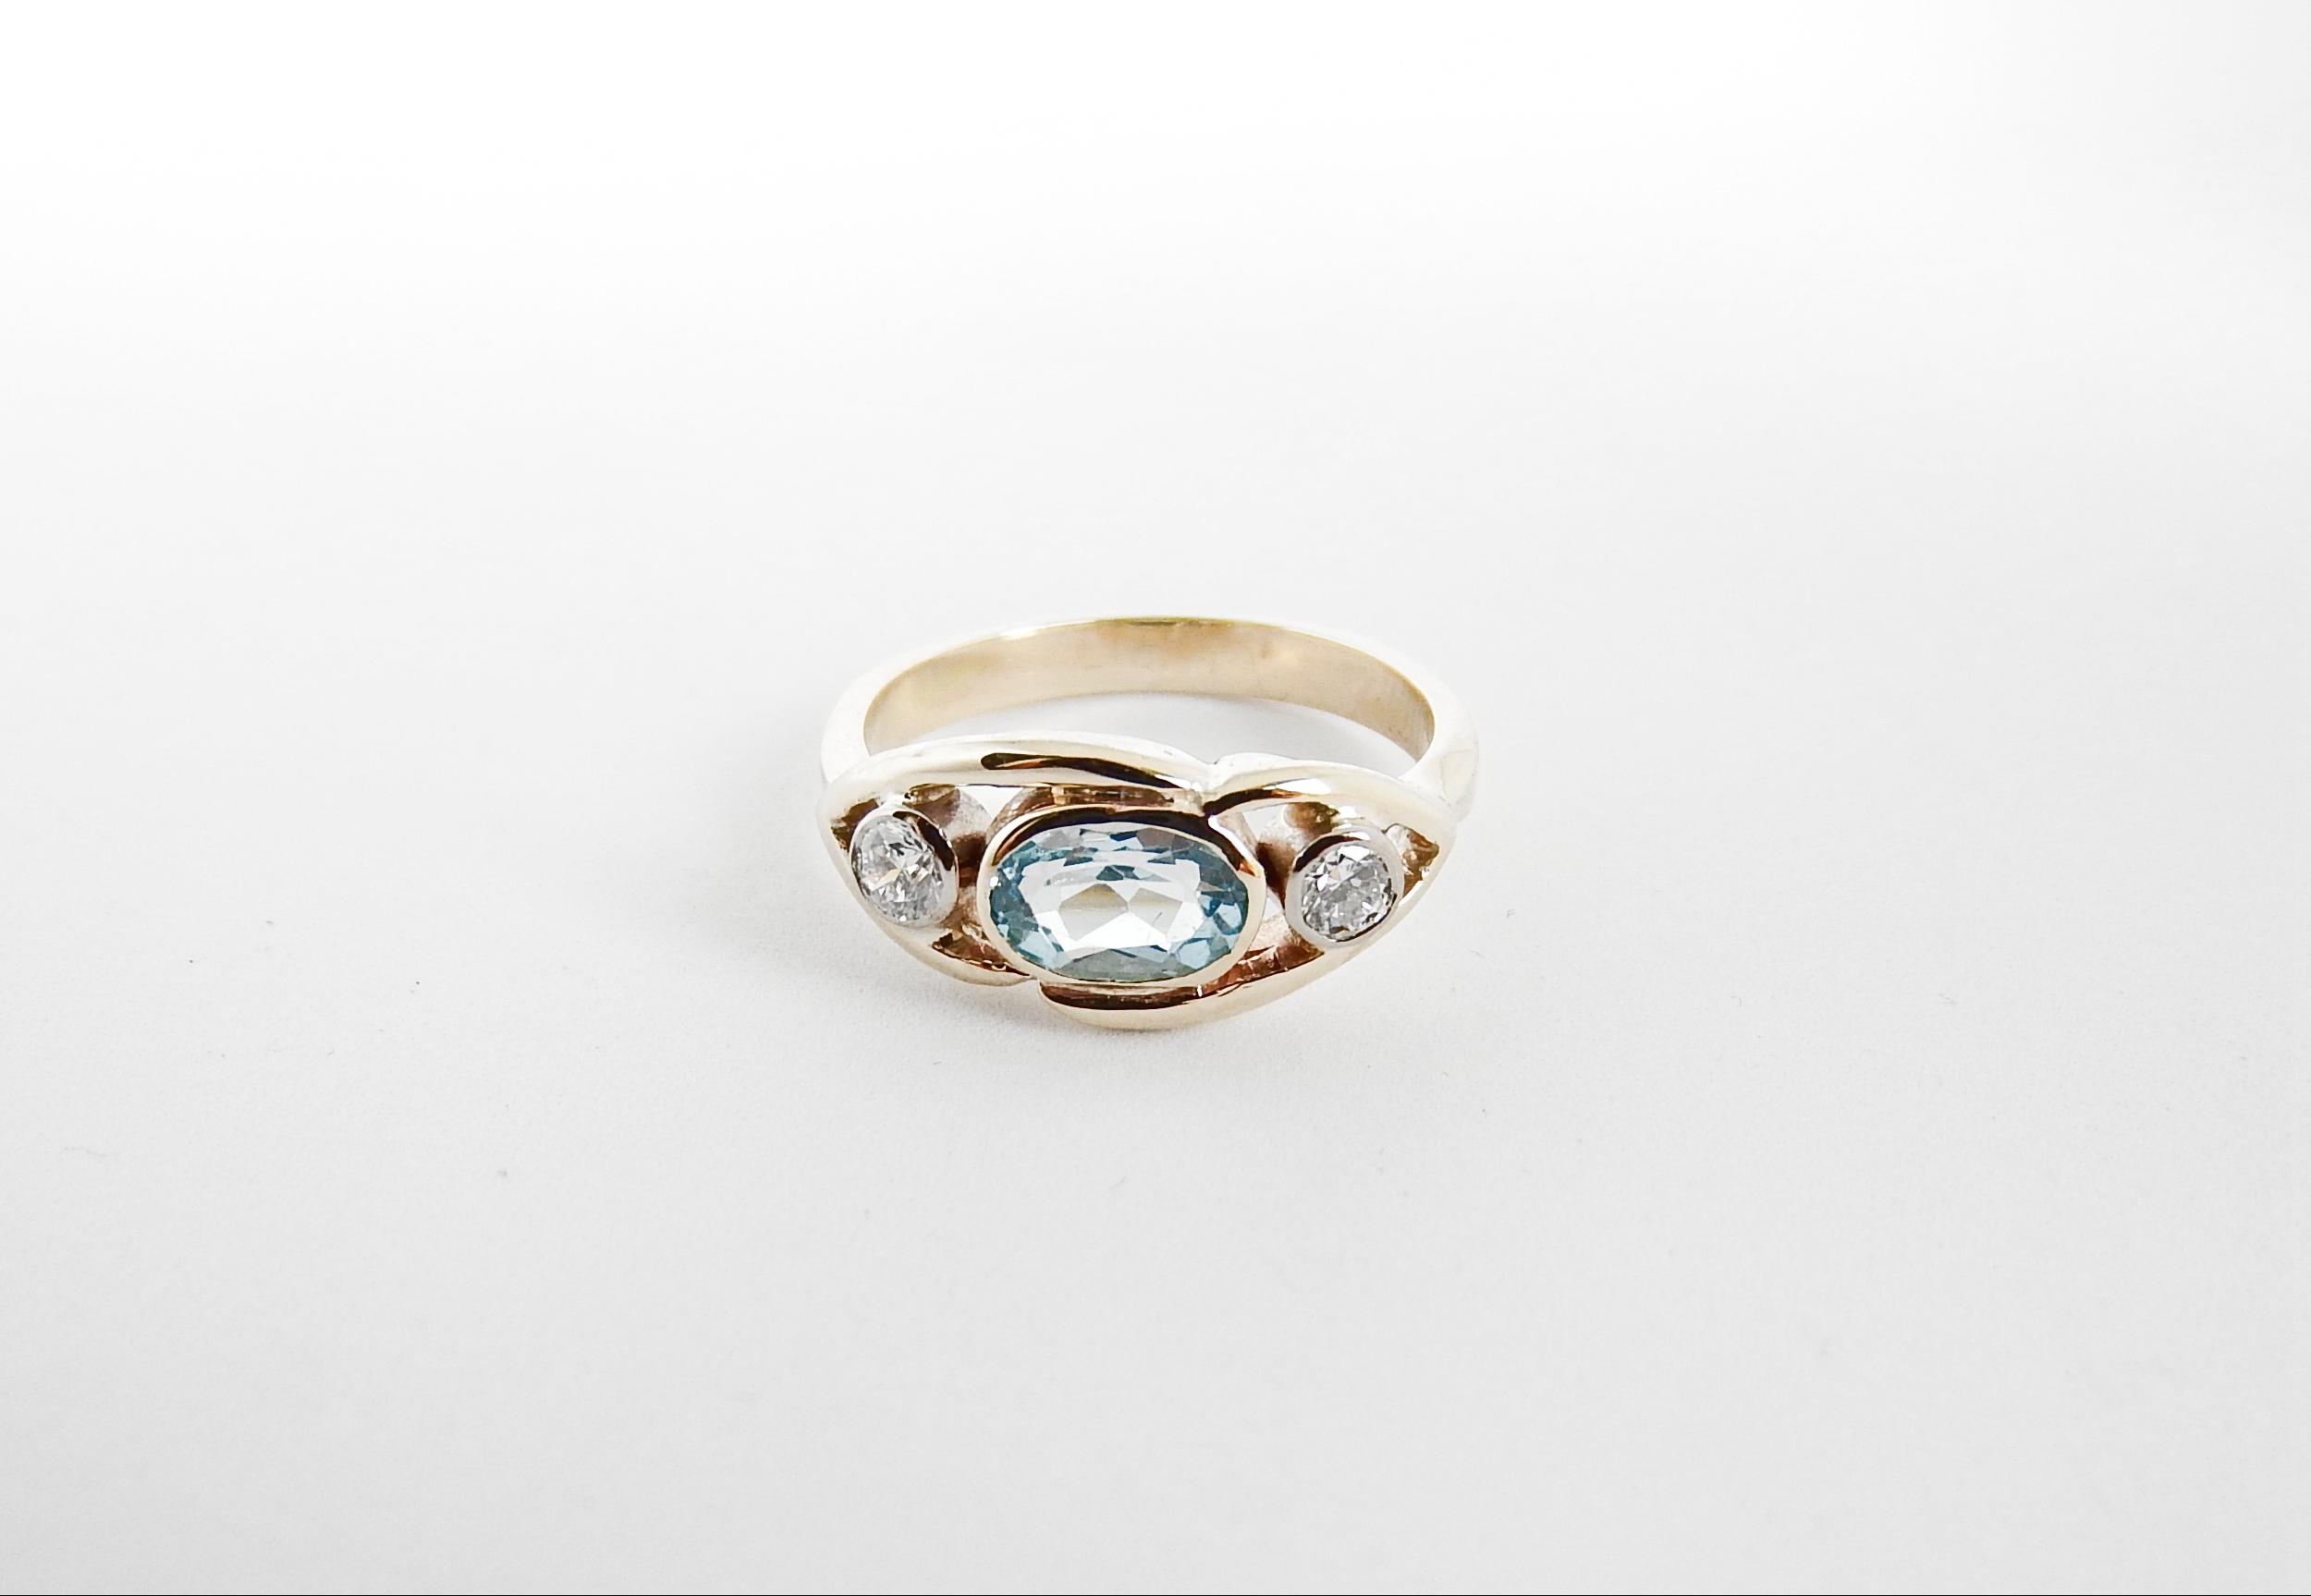 Herculean Knot Inspired Engagement Ring Alex Thiel Goldsmith